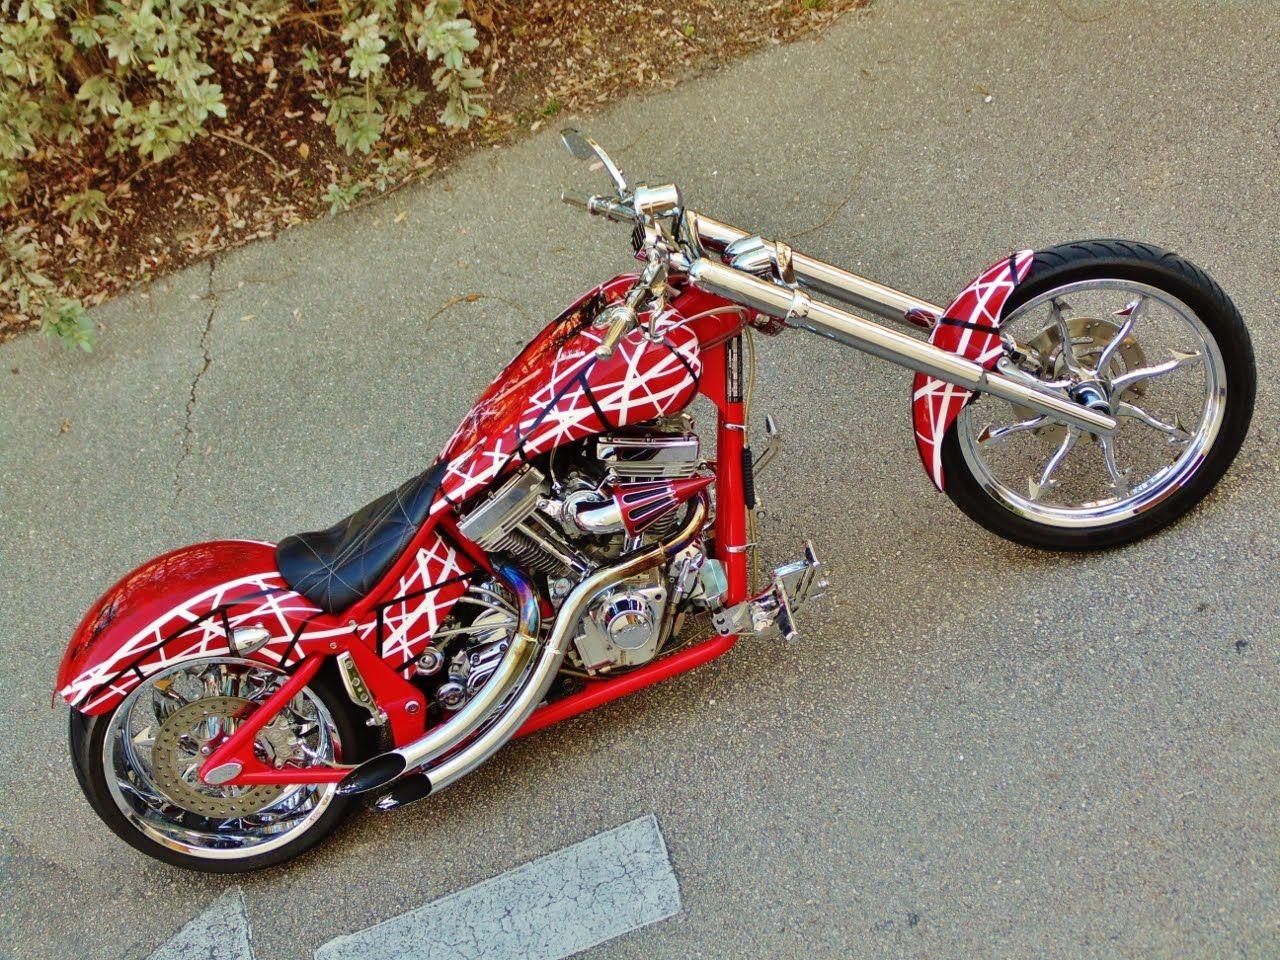 Van Halen Chopper American Ironhorse Walkaround For Sale Call 305 772 8635 Peter Van Halen Custom Street Bikes Chopper